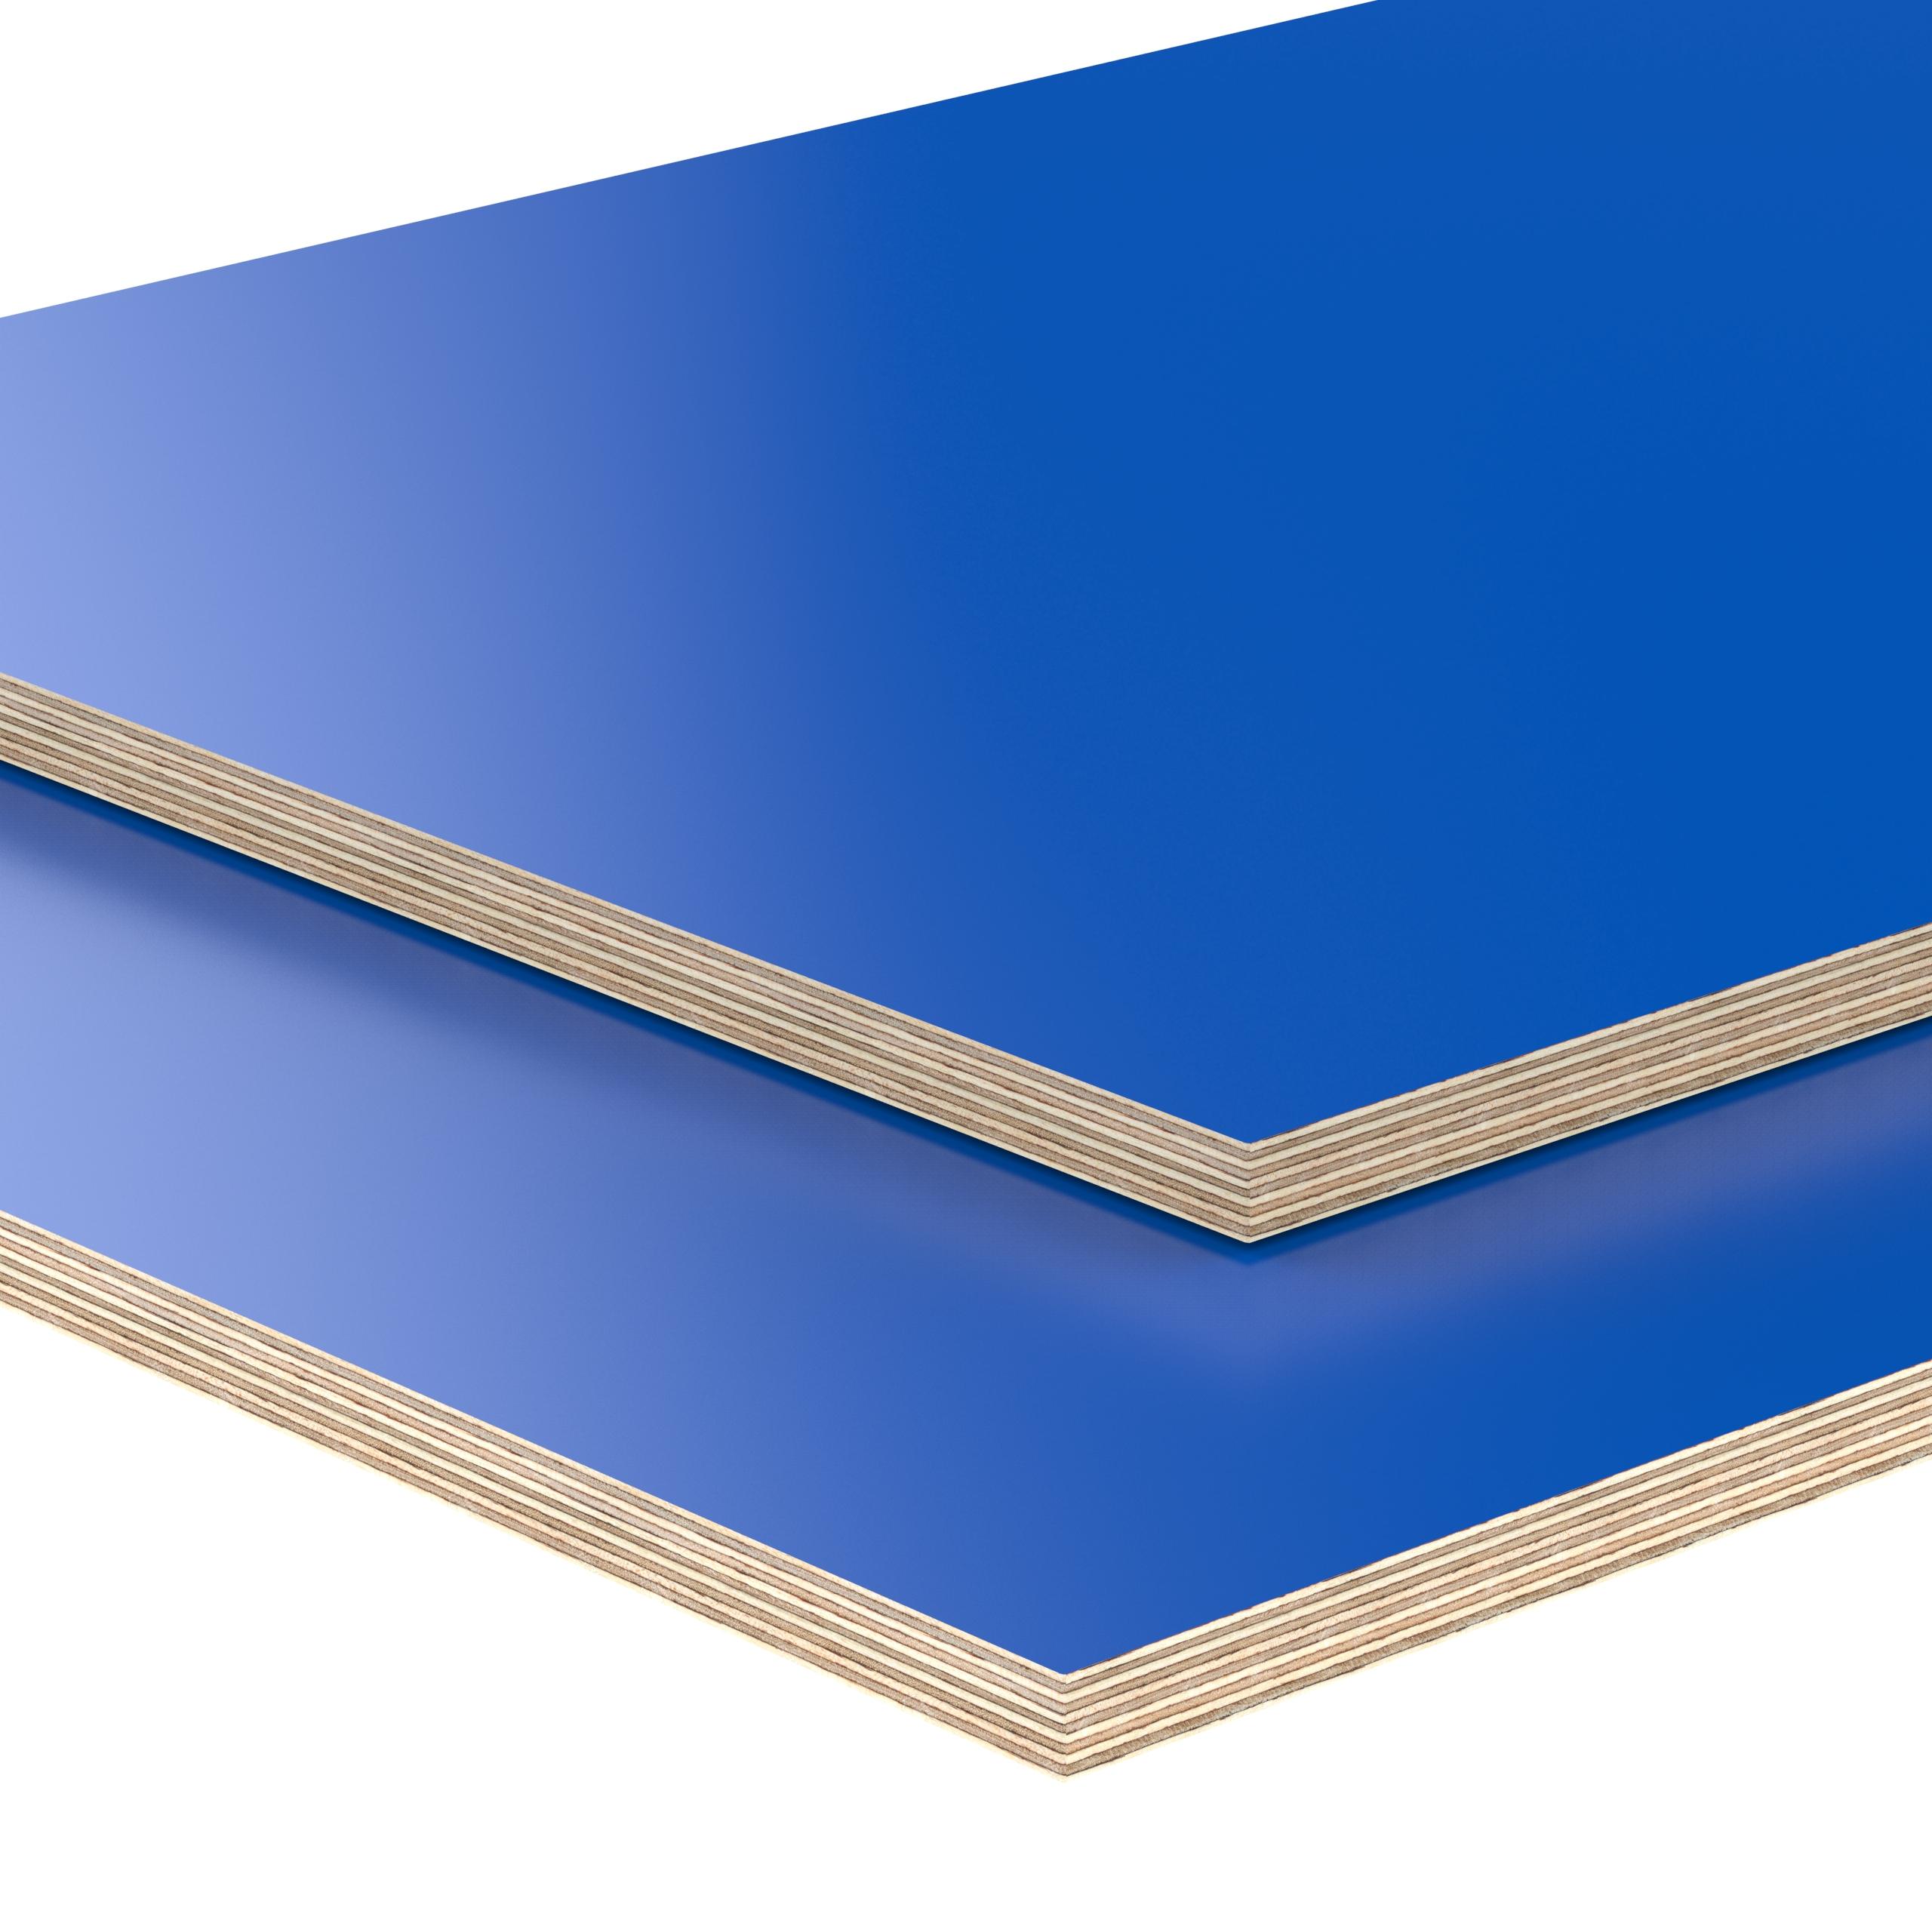 90x50 cm 18mm Multiplex Zuschnitt wei/ß melaminbeschichtet L/änge bis 200cm Multiplexplatten Zuschnitte Auswahl